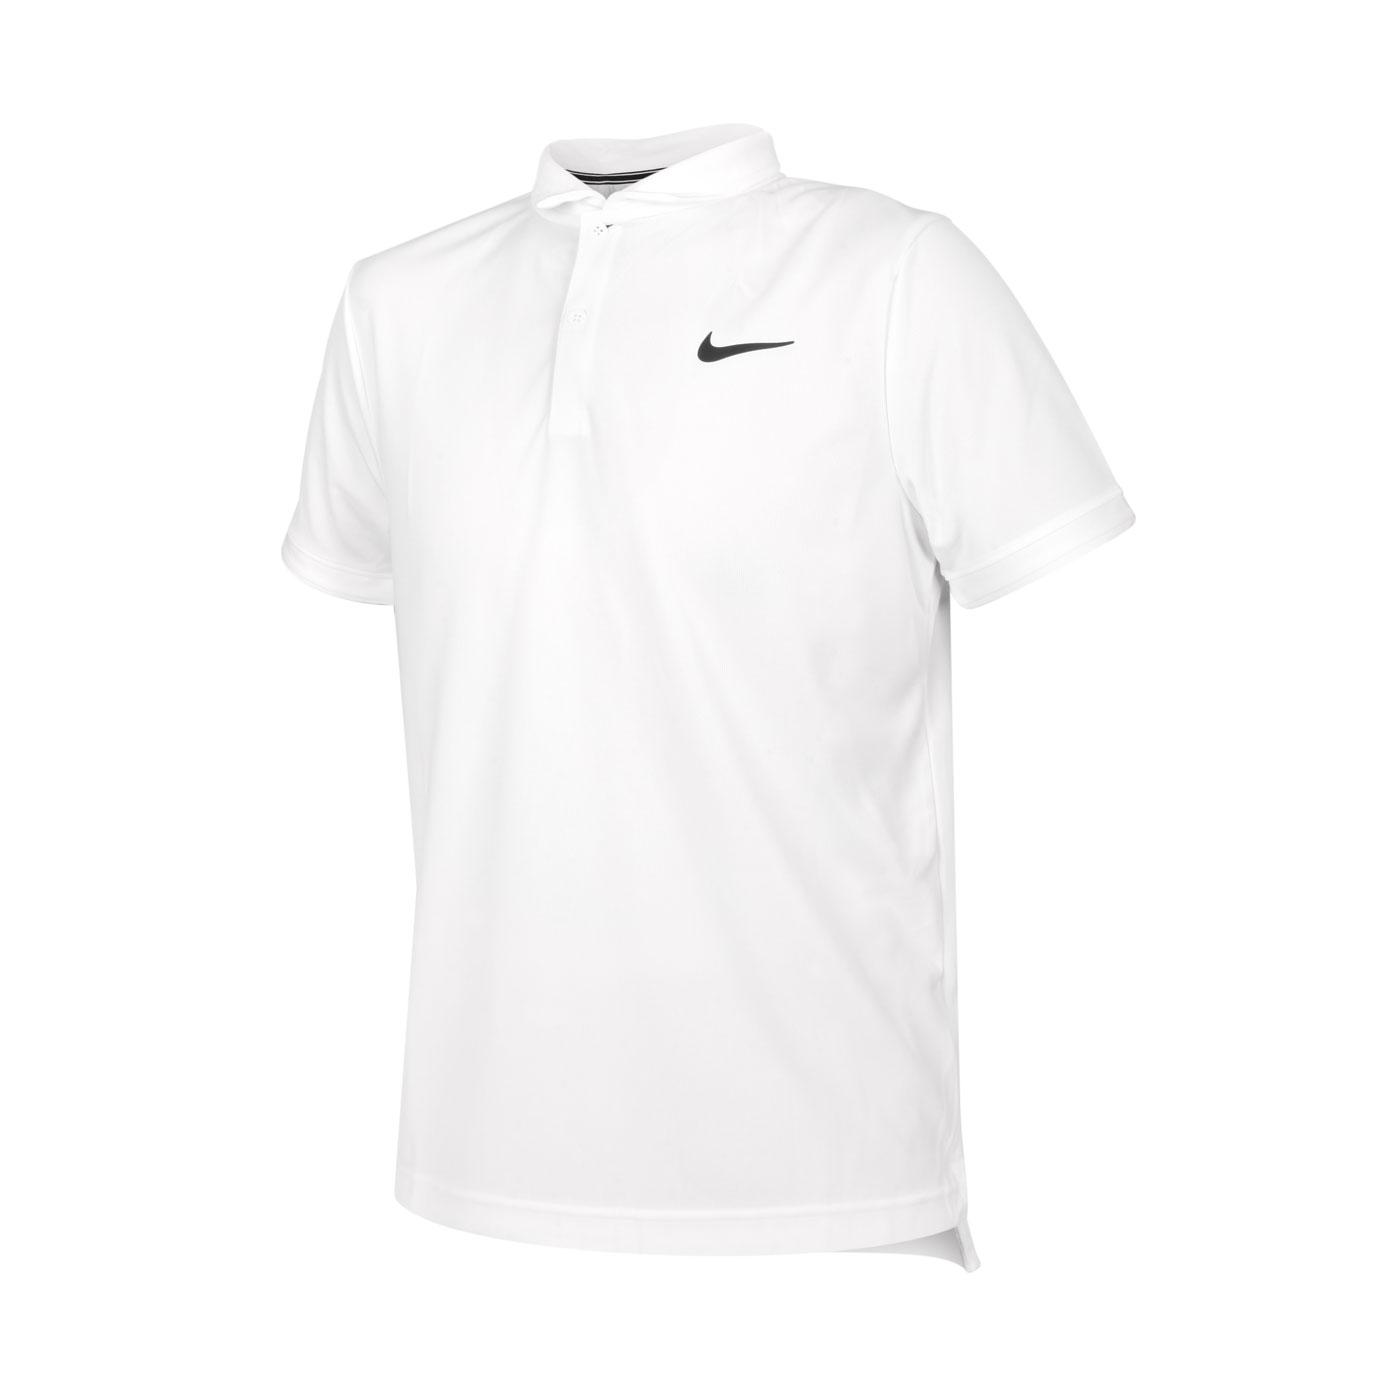 NIKE 男款短袖POLO衫 CW6851-100